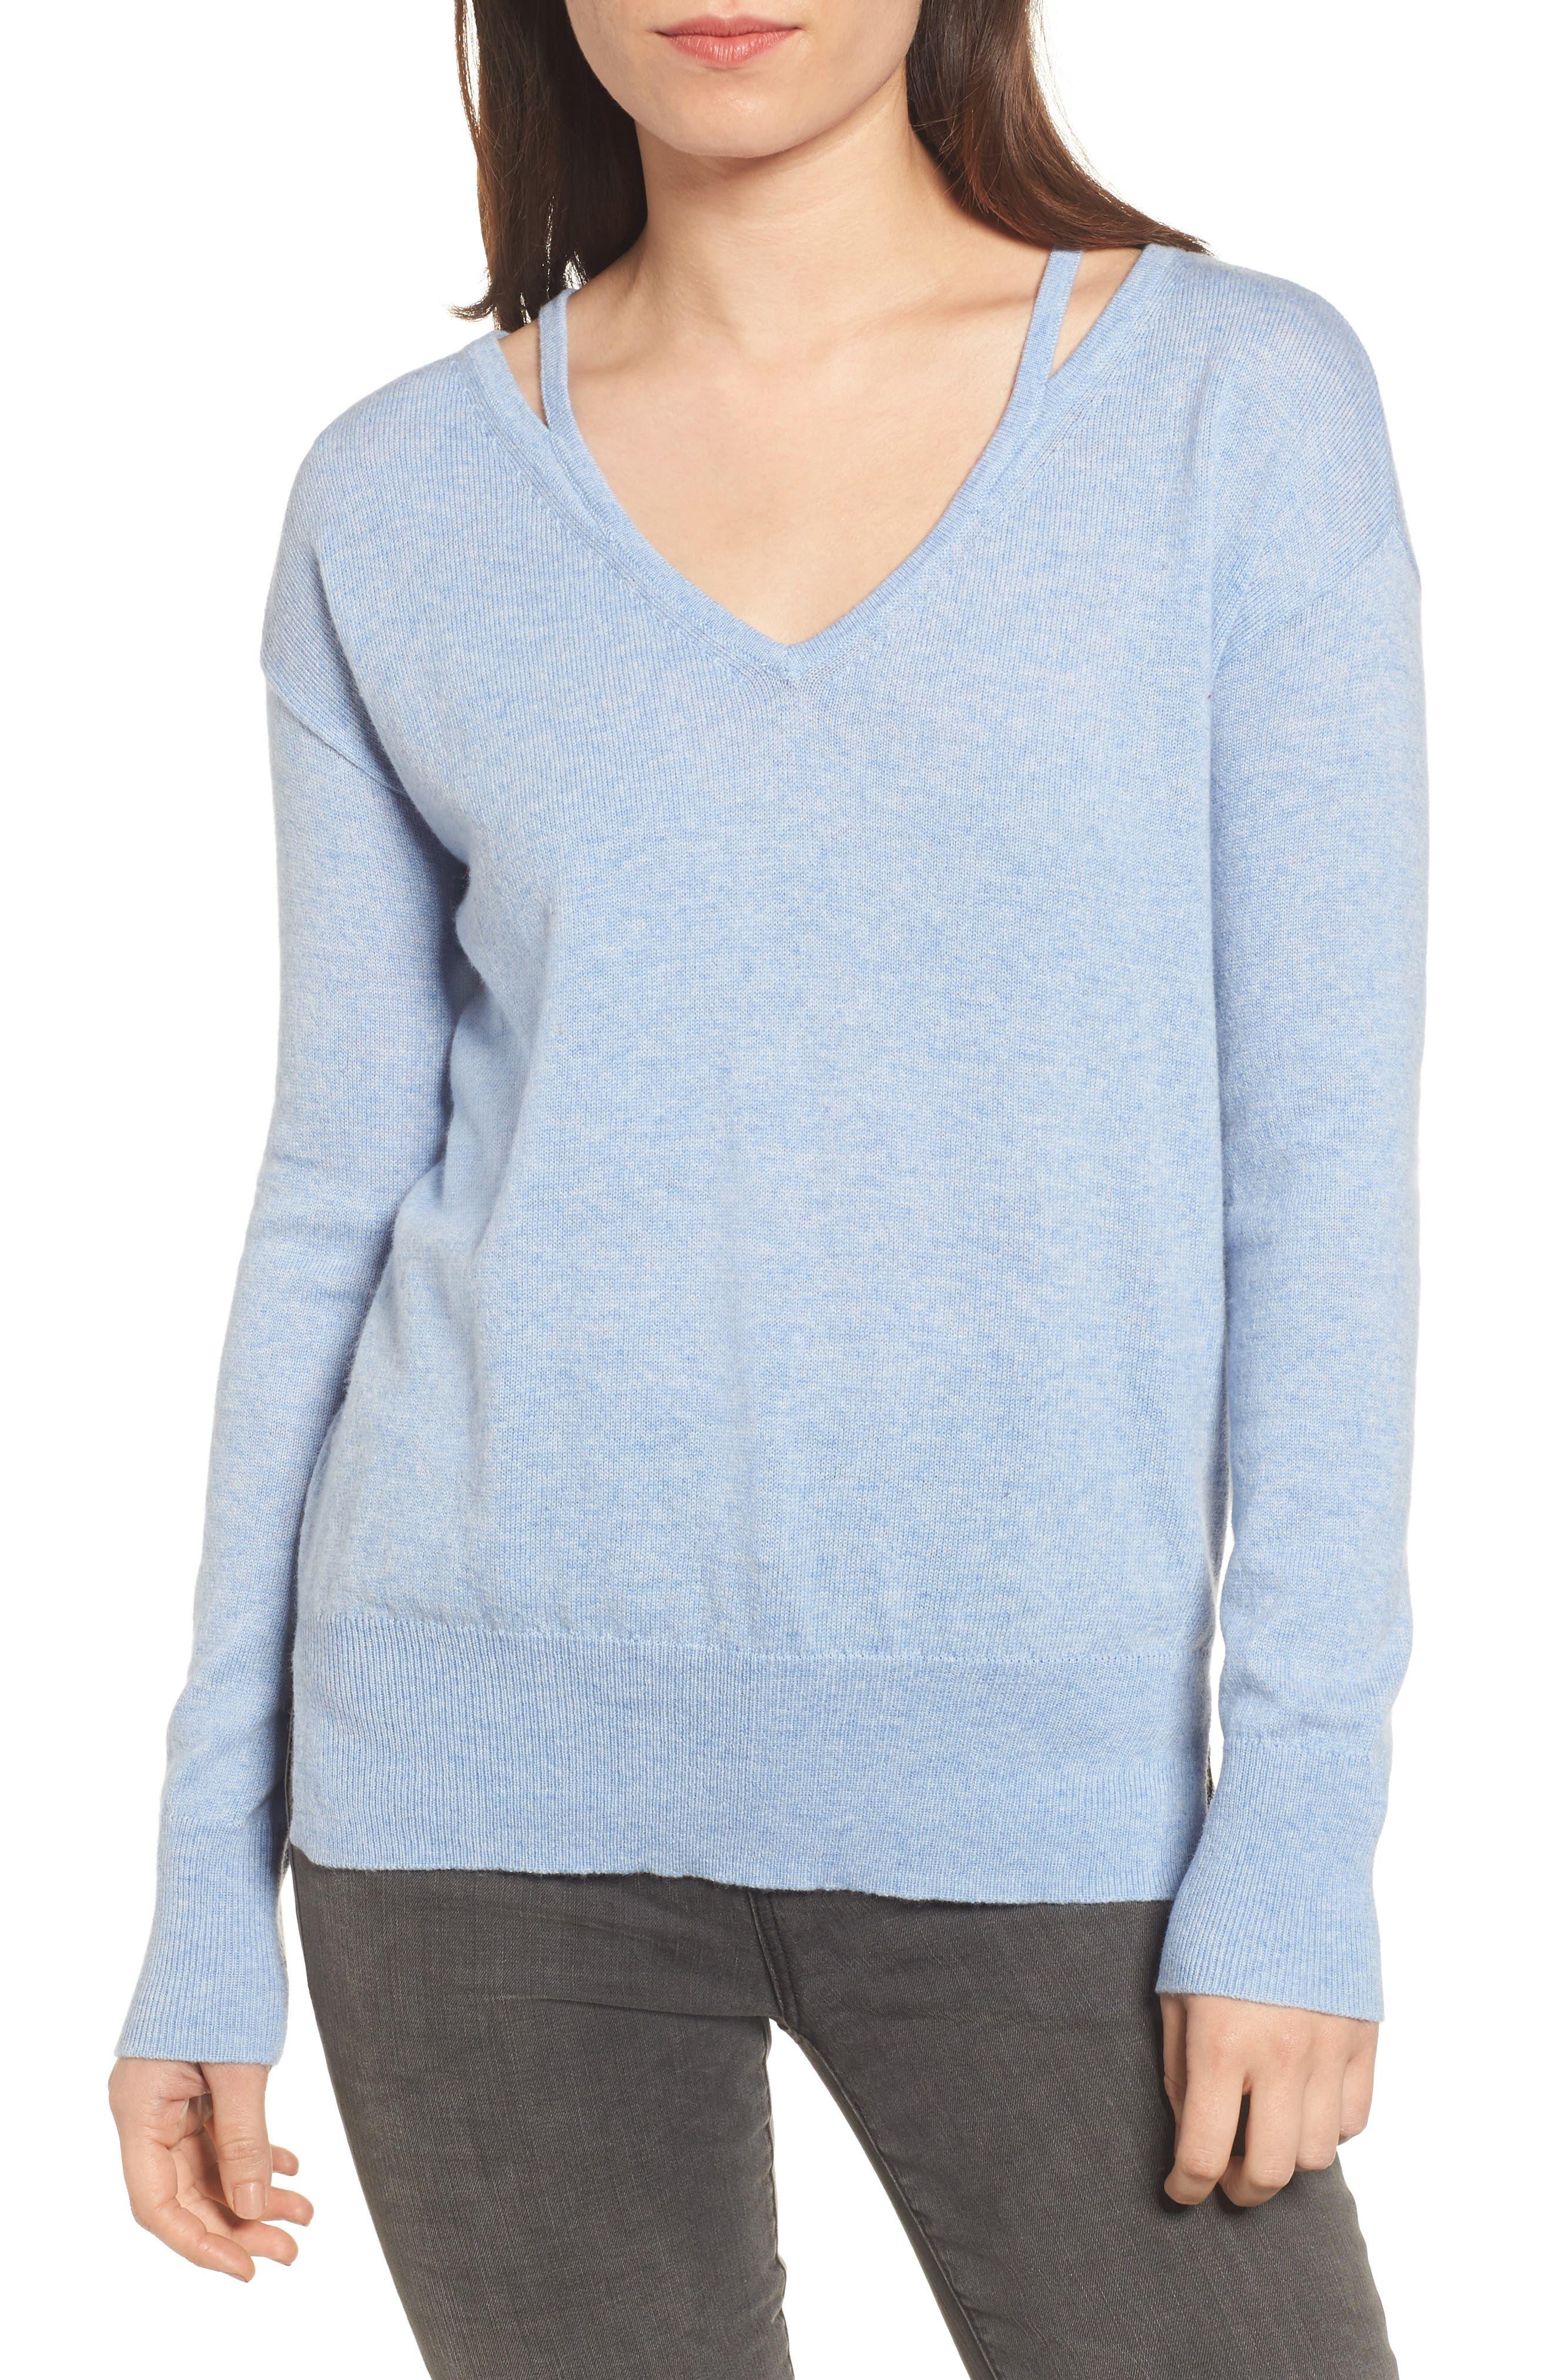 Kenley Wool & Cashmere Sweater,                         Main,                         color, Lavender/ Blue